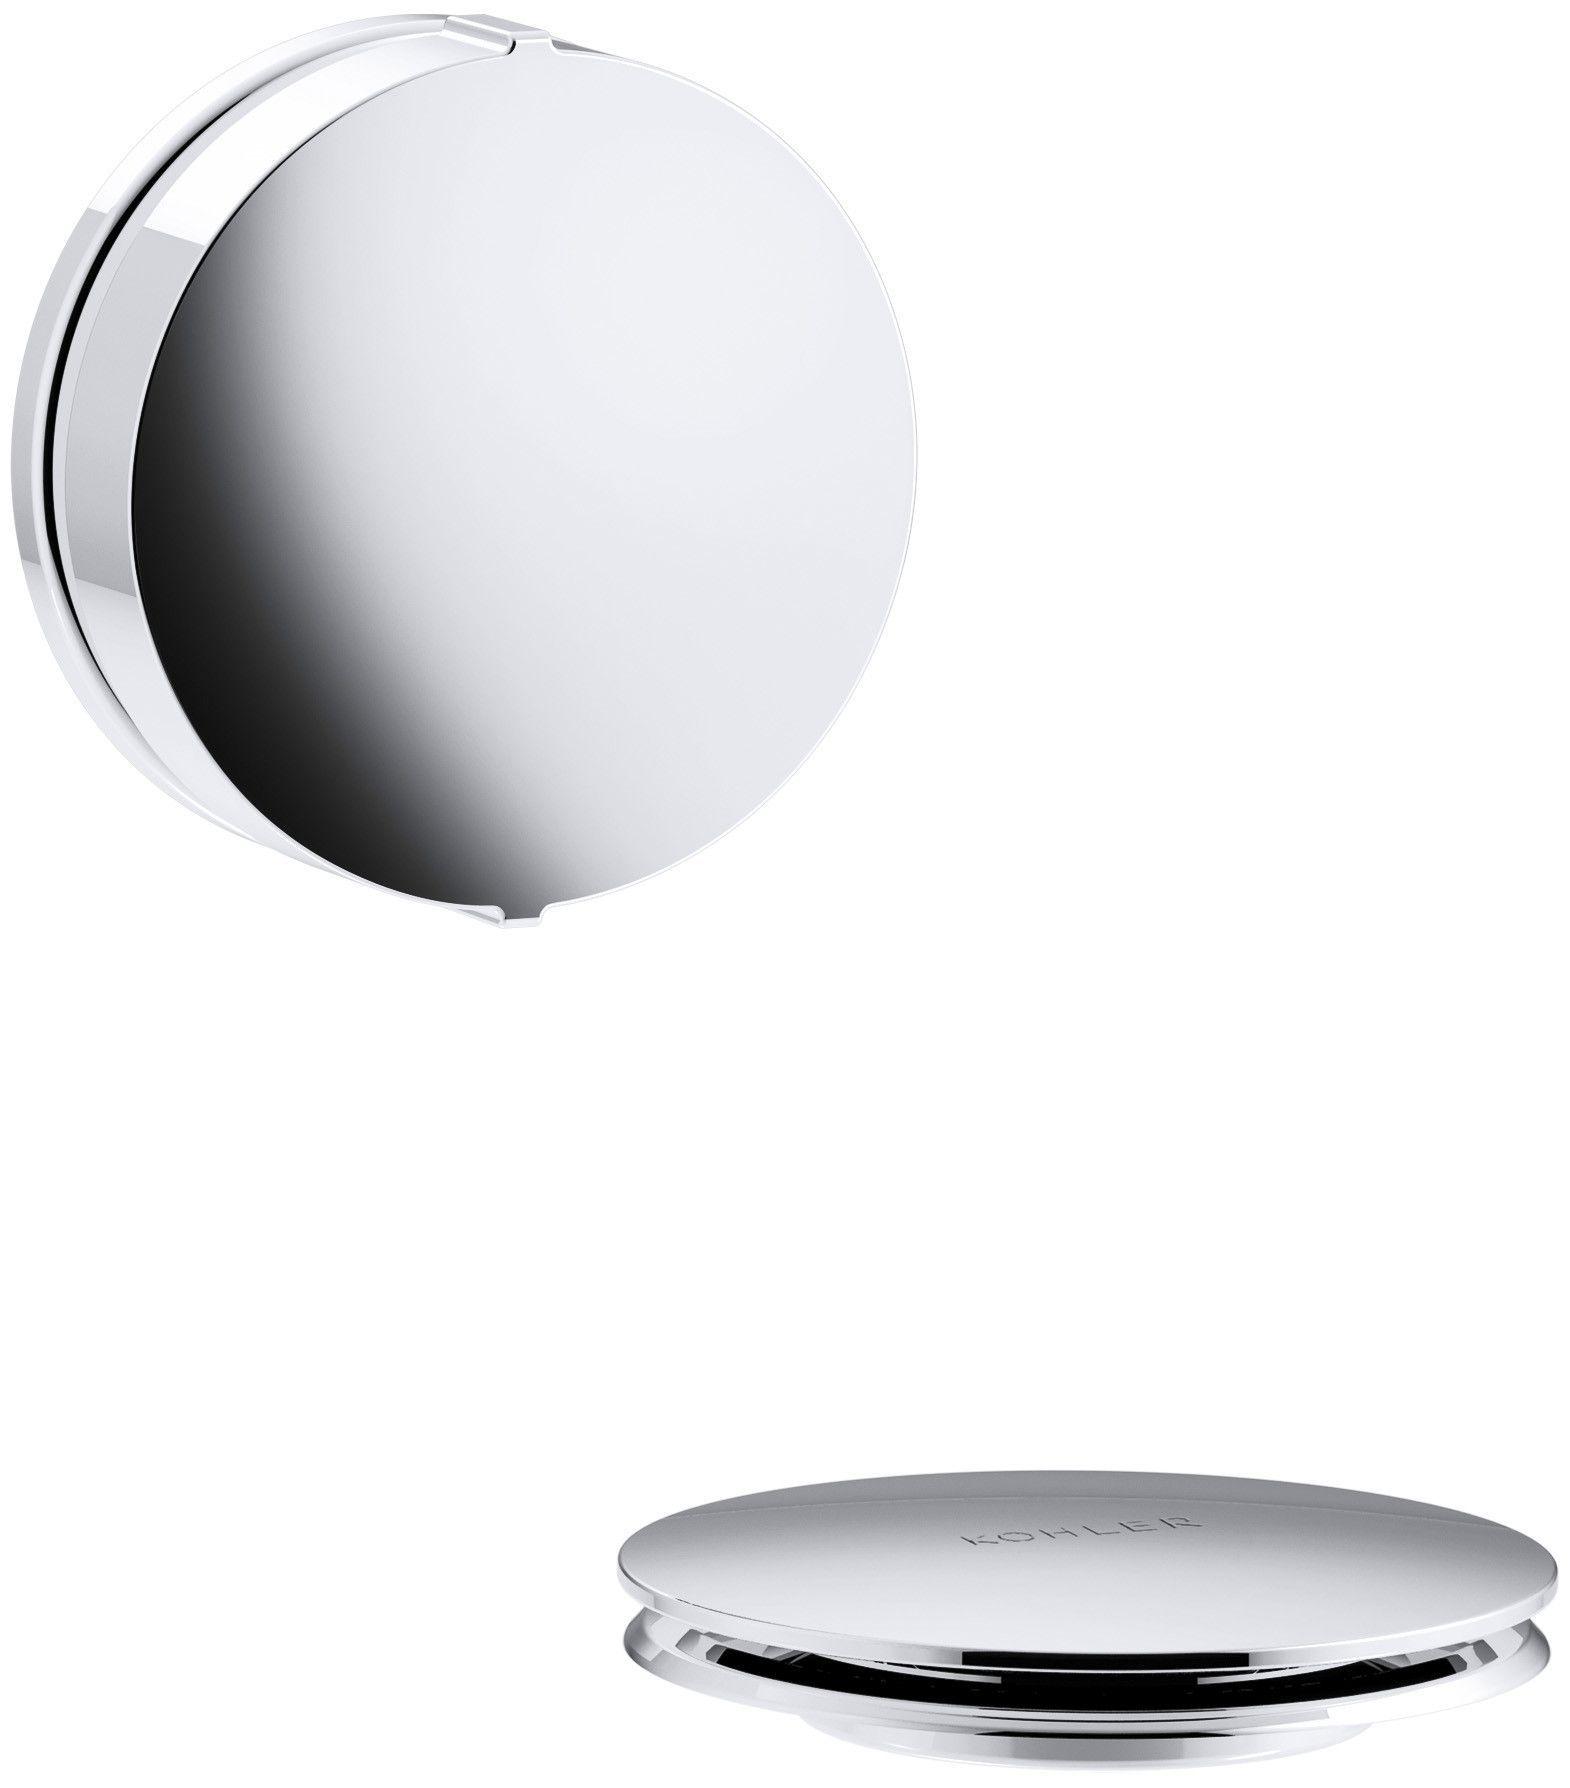 Pureflo Drain Stopper Tub Drain Polished Chrome Bathtub